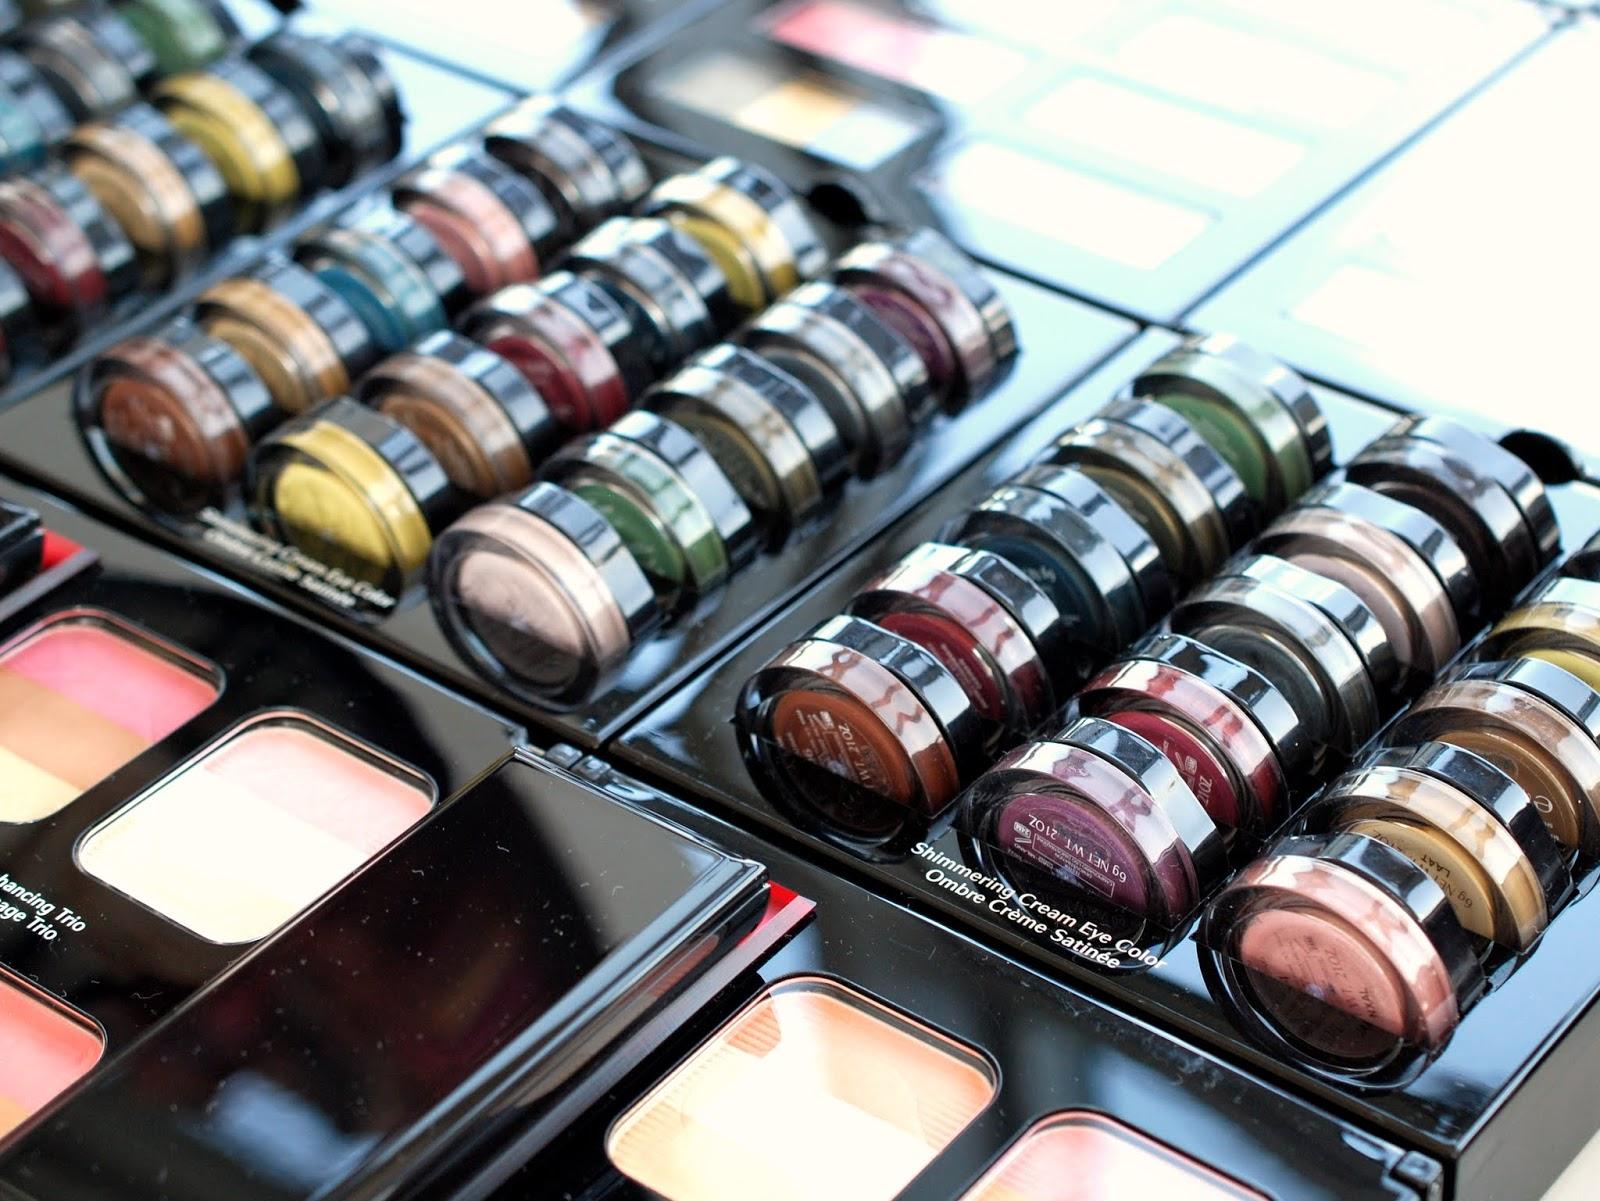 Shiseido Beauty Academy Düsseldorf